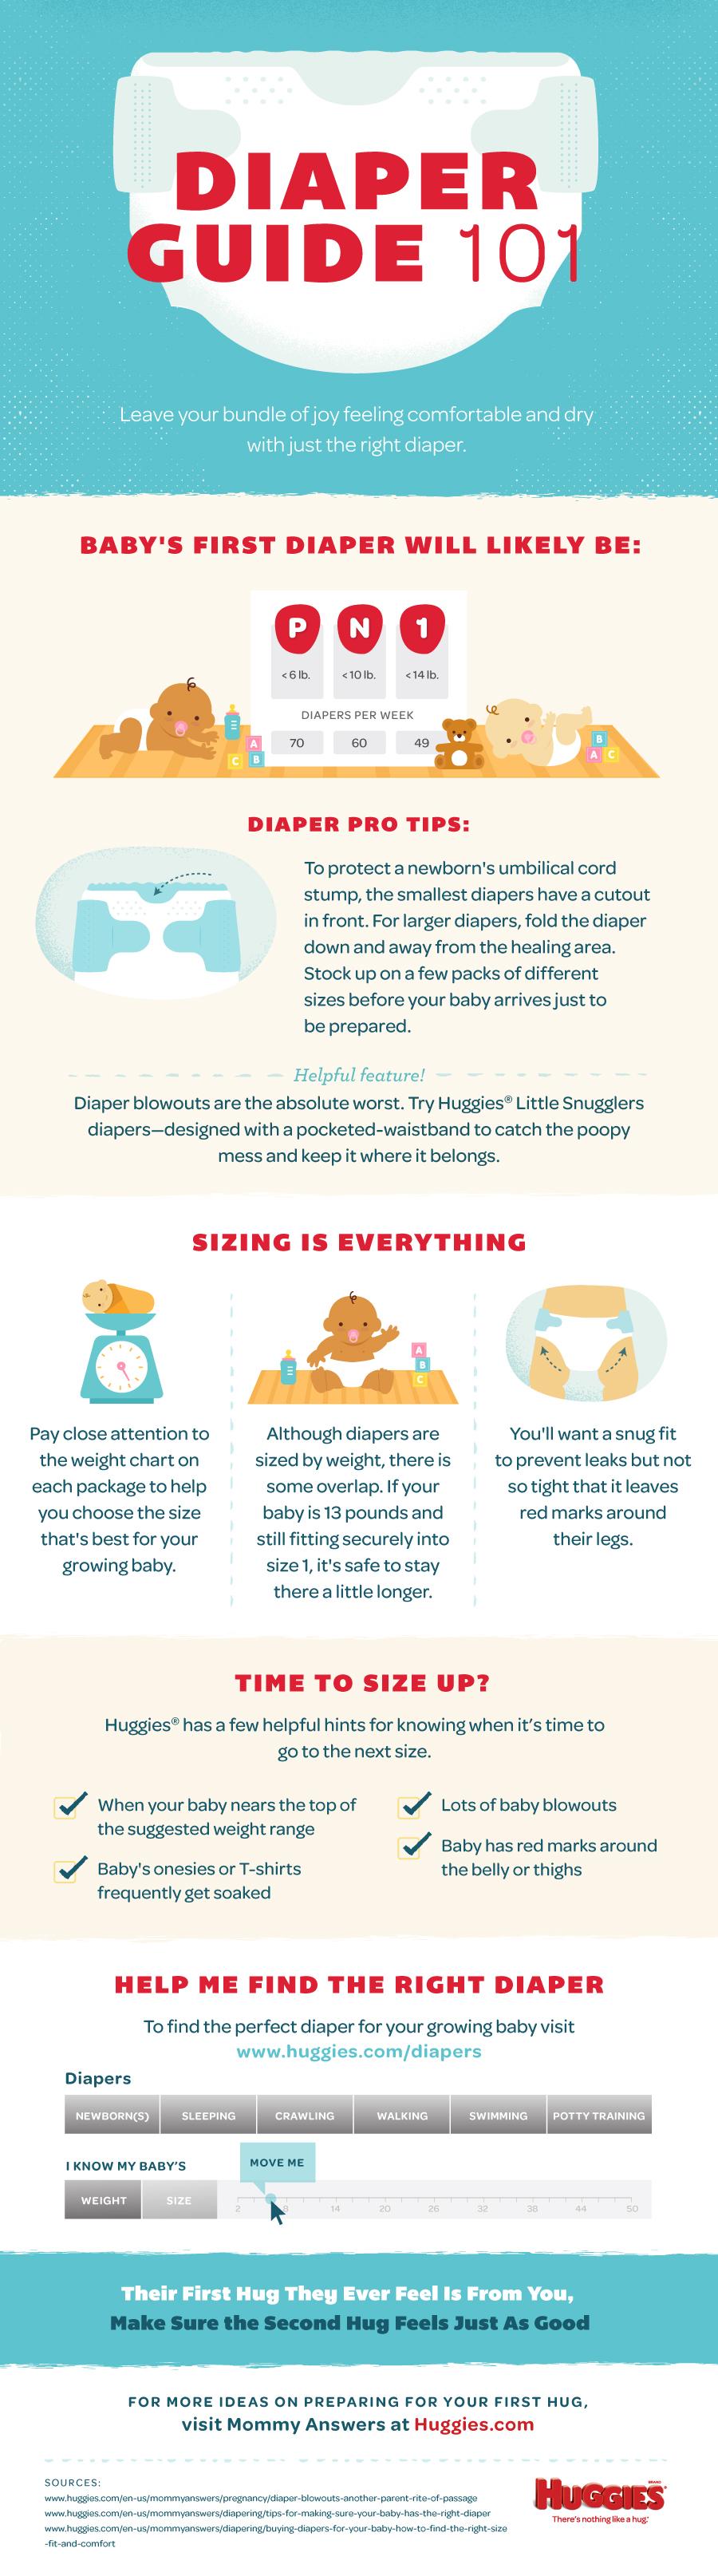 Diaper Guide 101